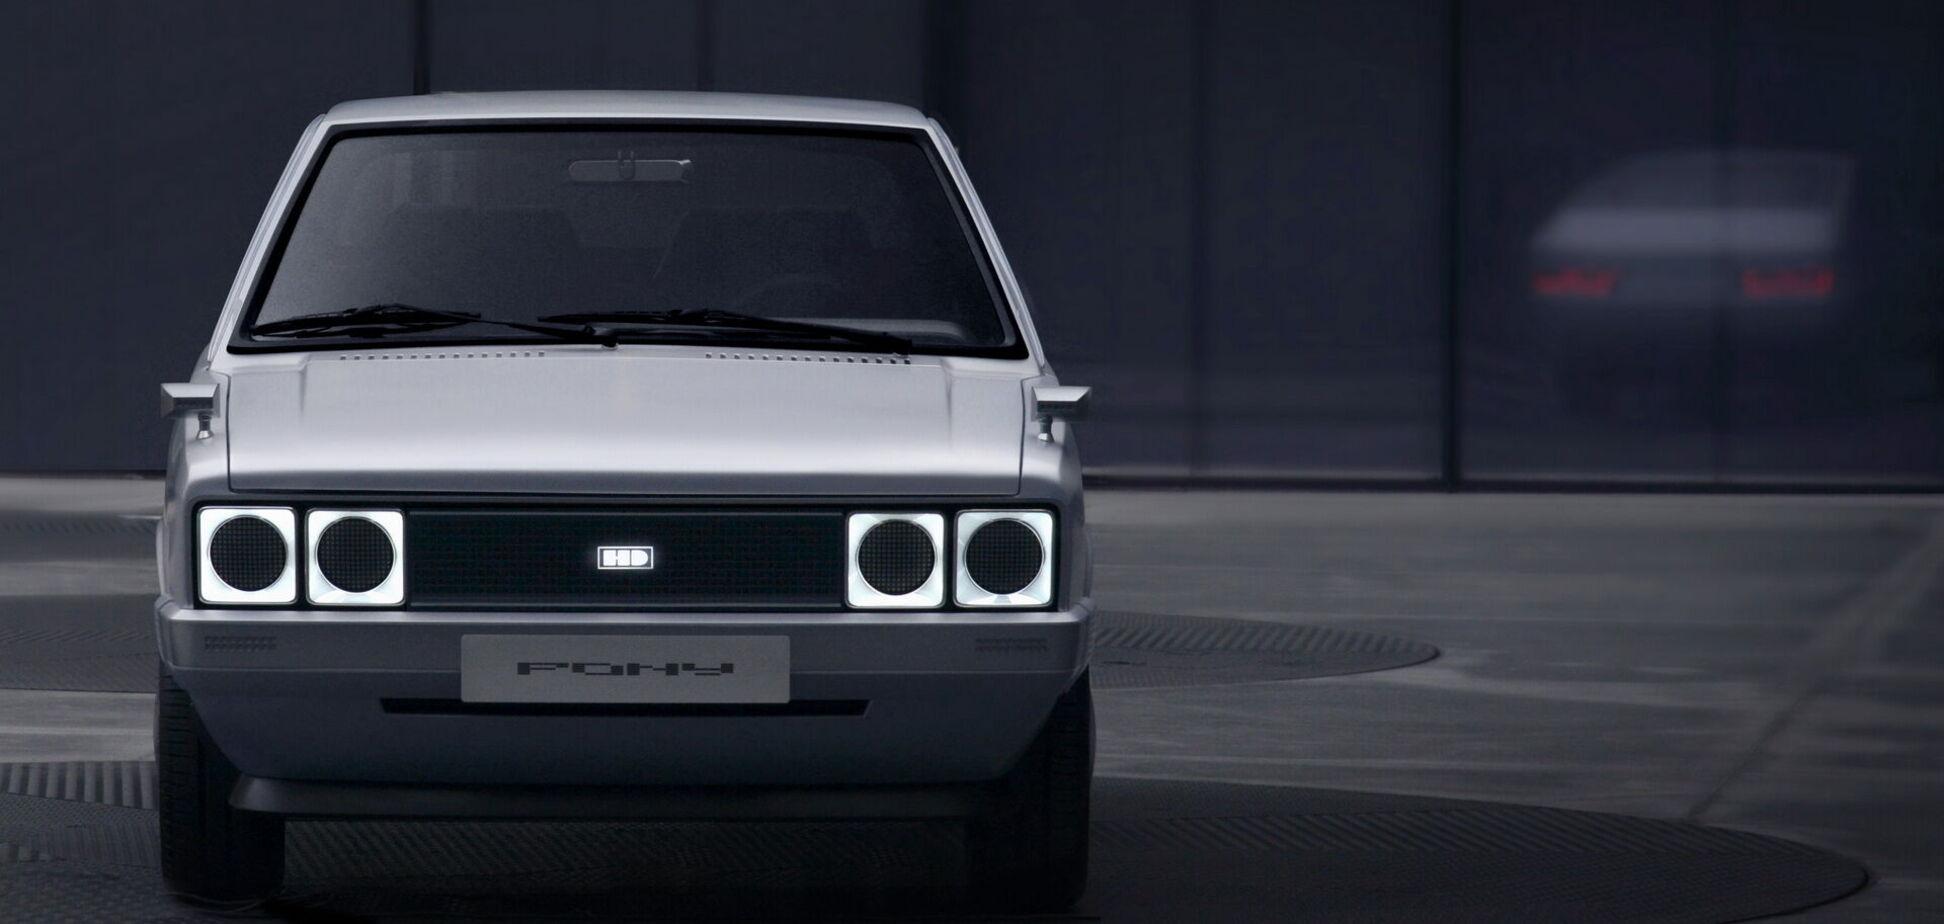 HyundaiPony